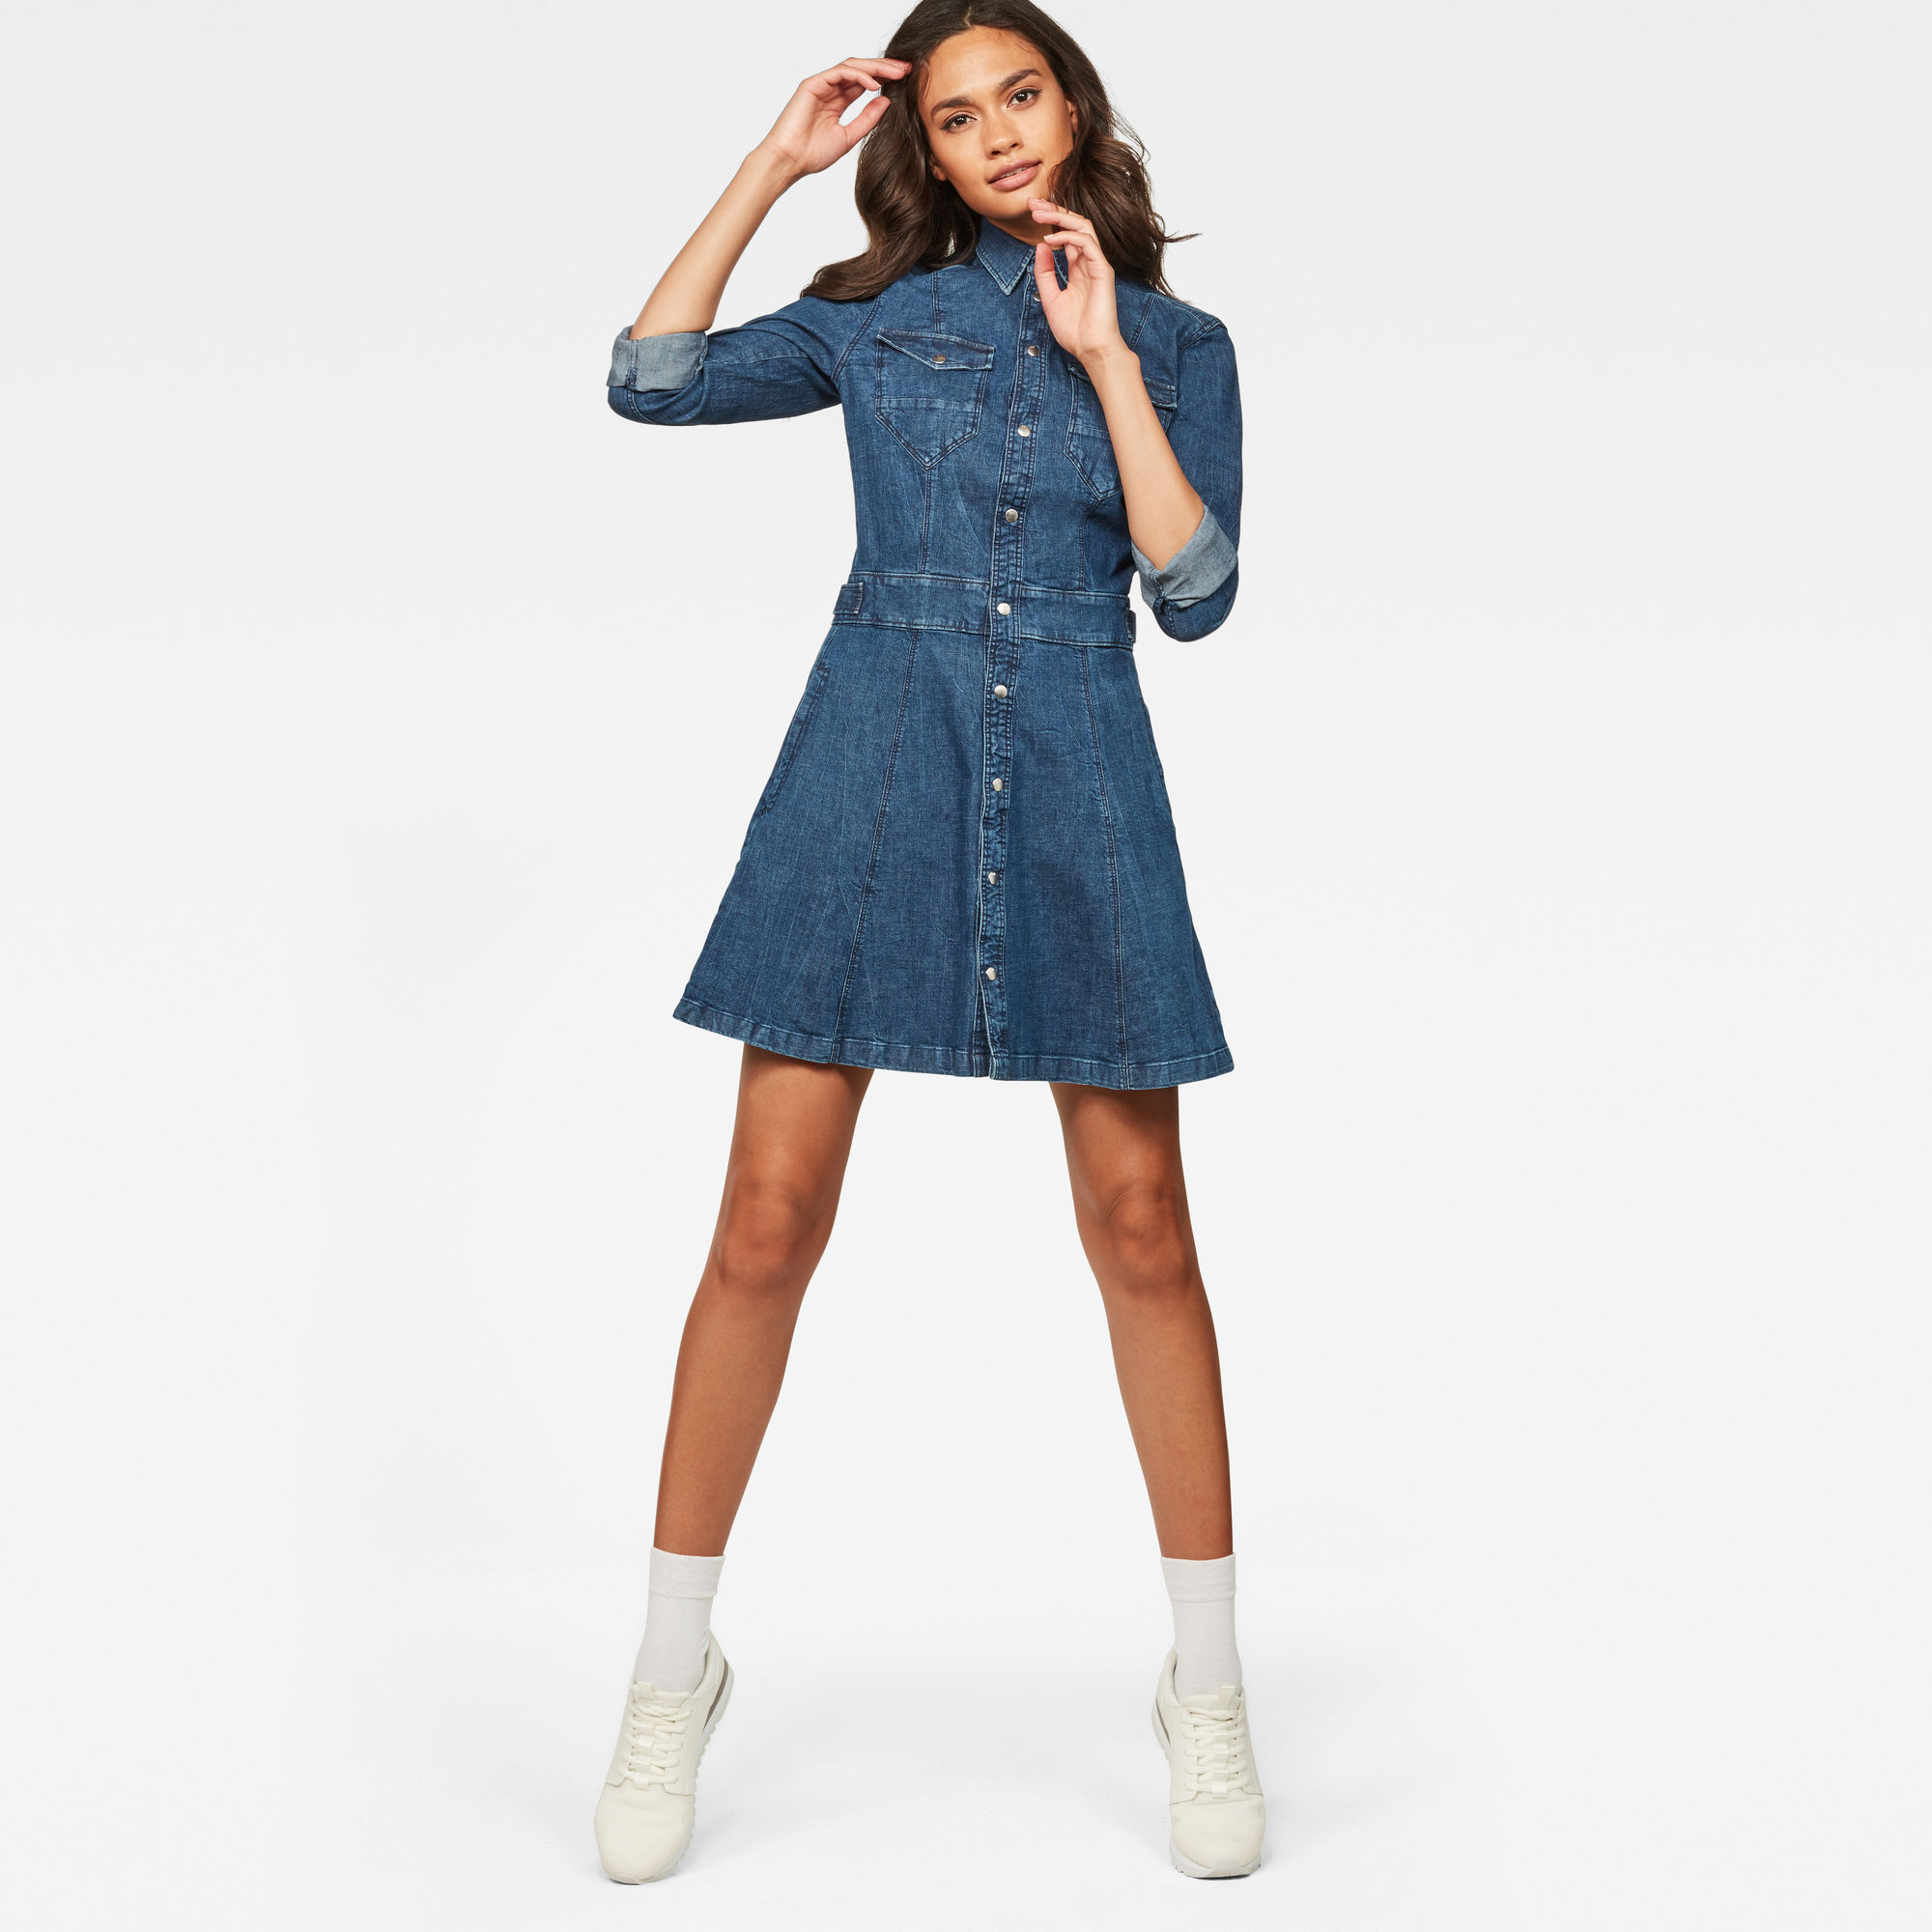 Tacoma Flare Dress